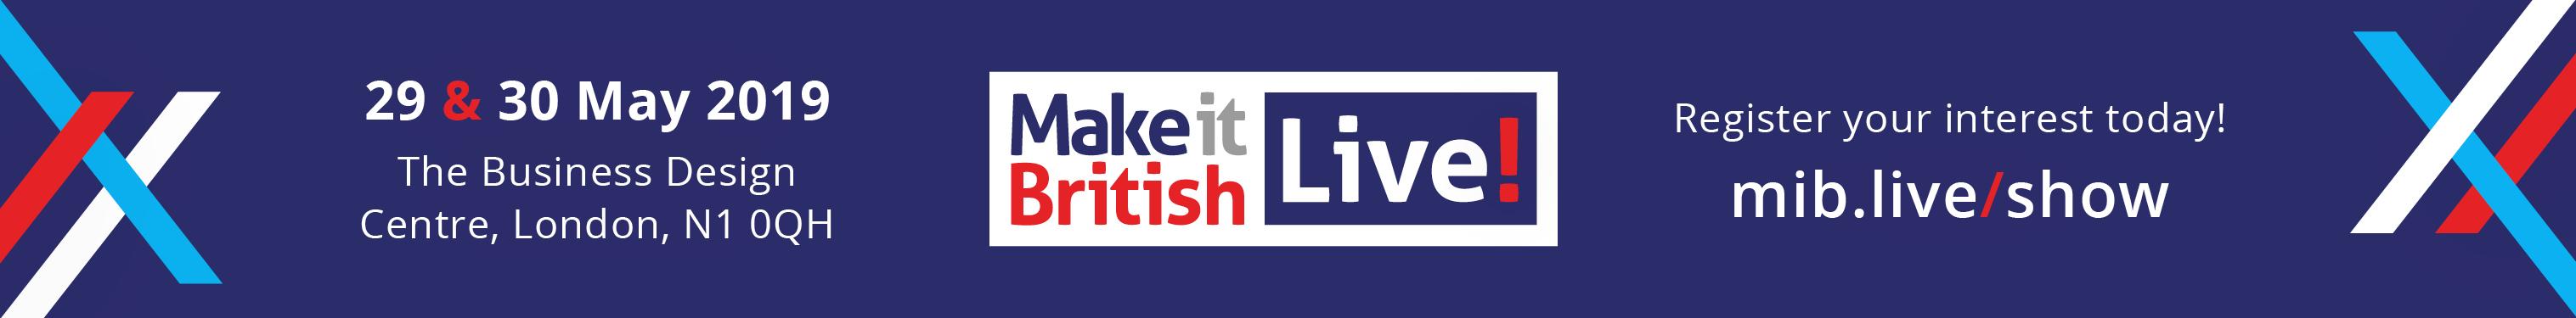 Make it British Live!, Lucy Siegle, sustainability